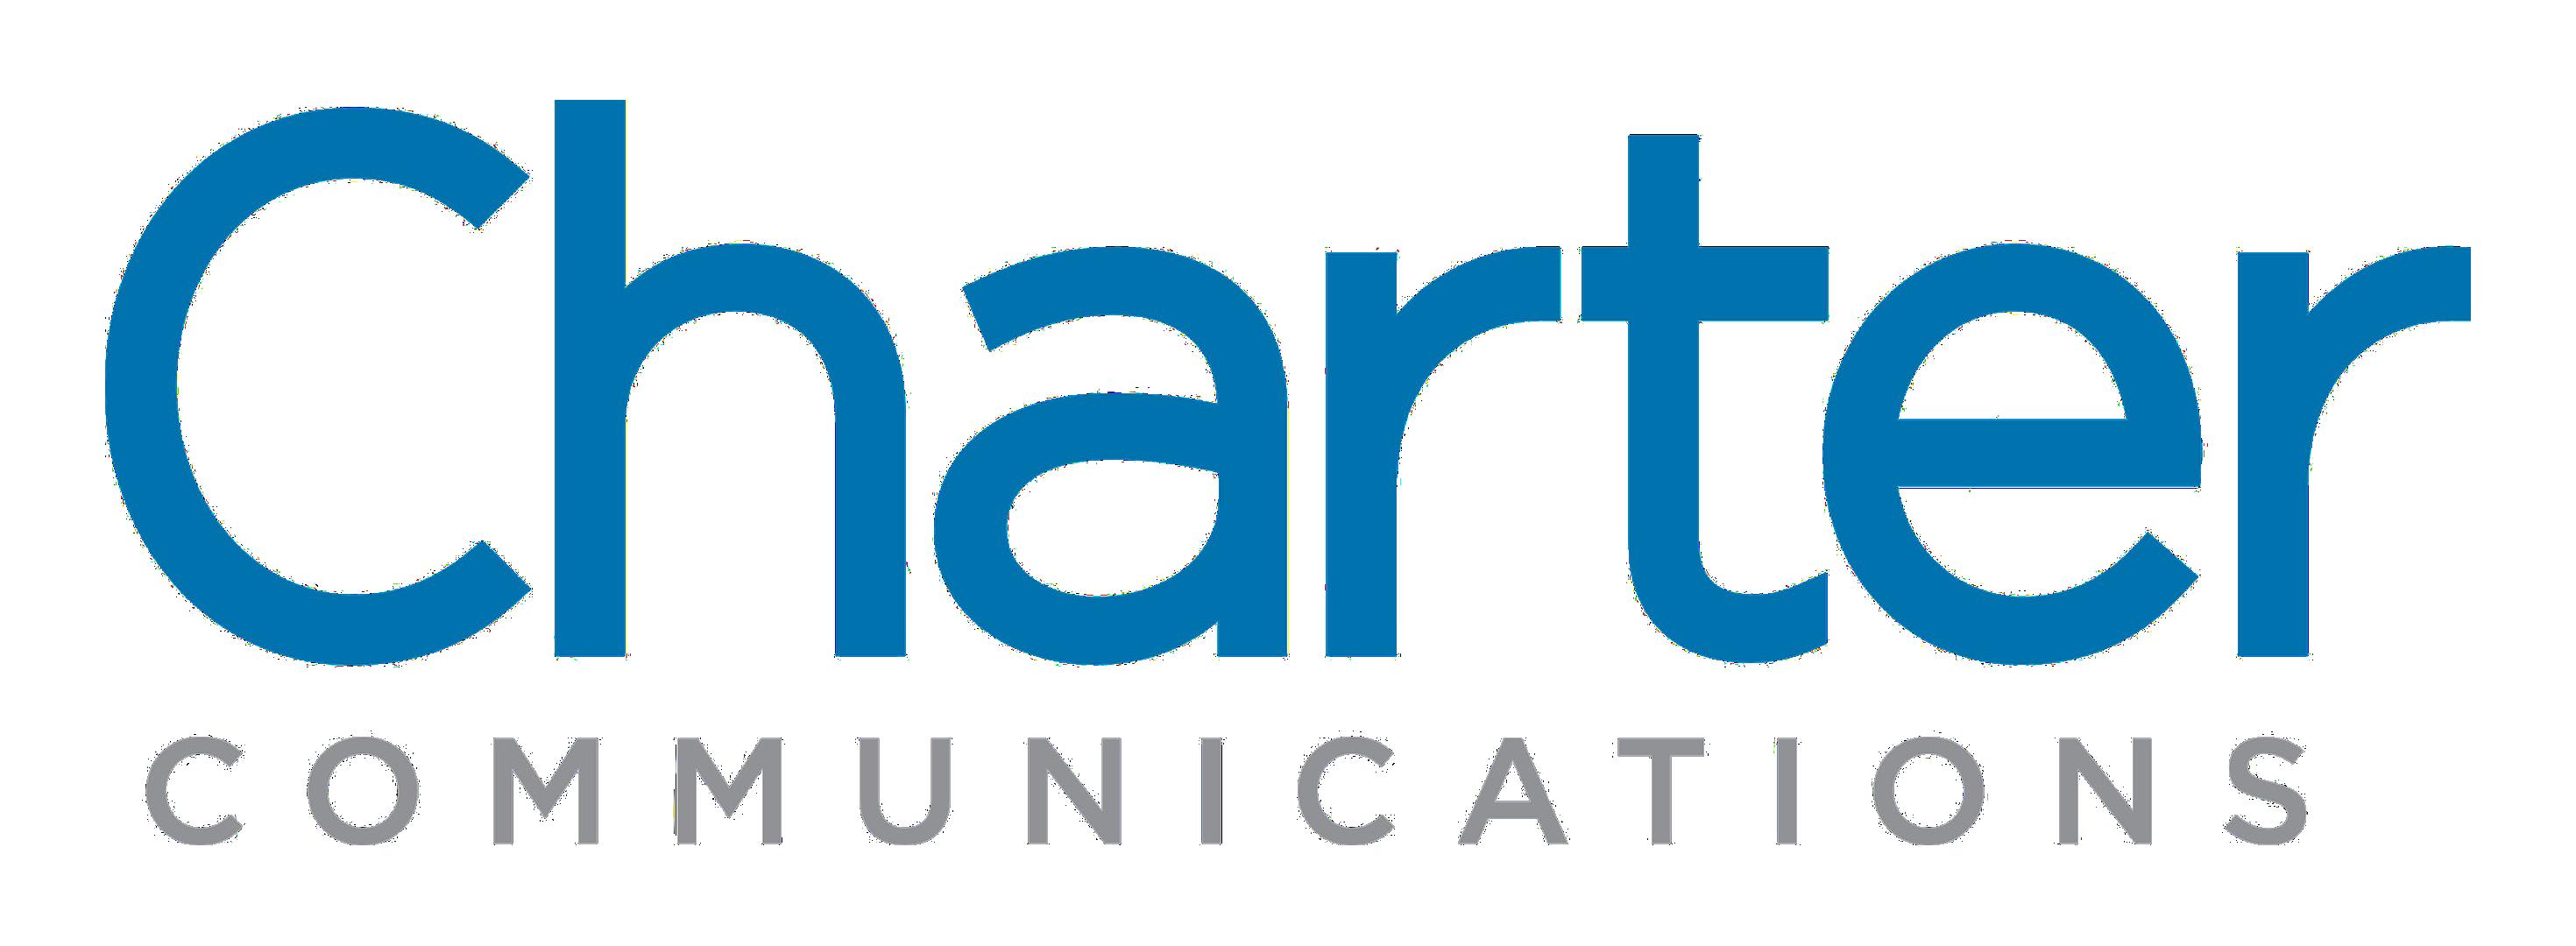 Charter Communications Logo PNG Image.